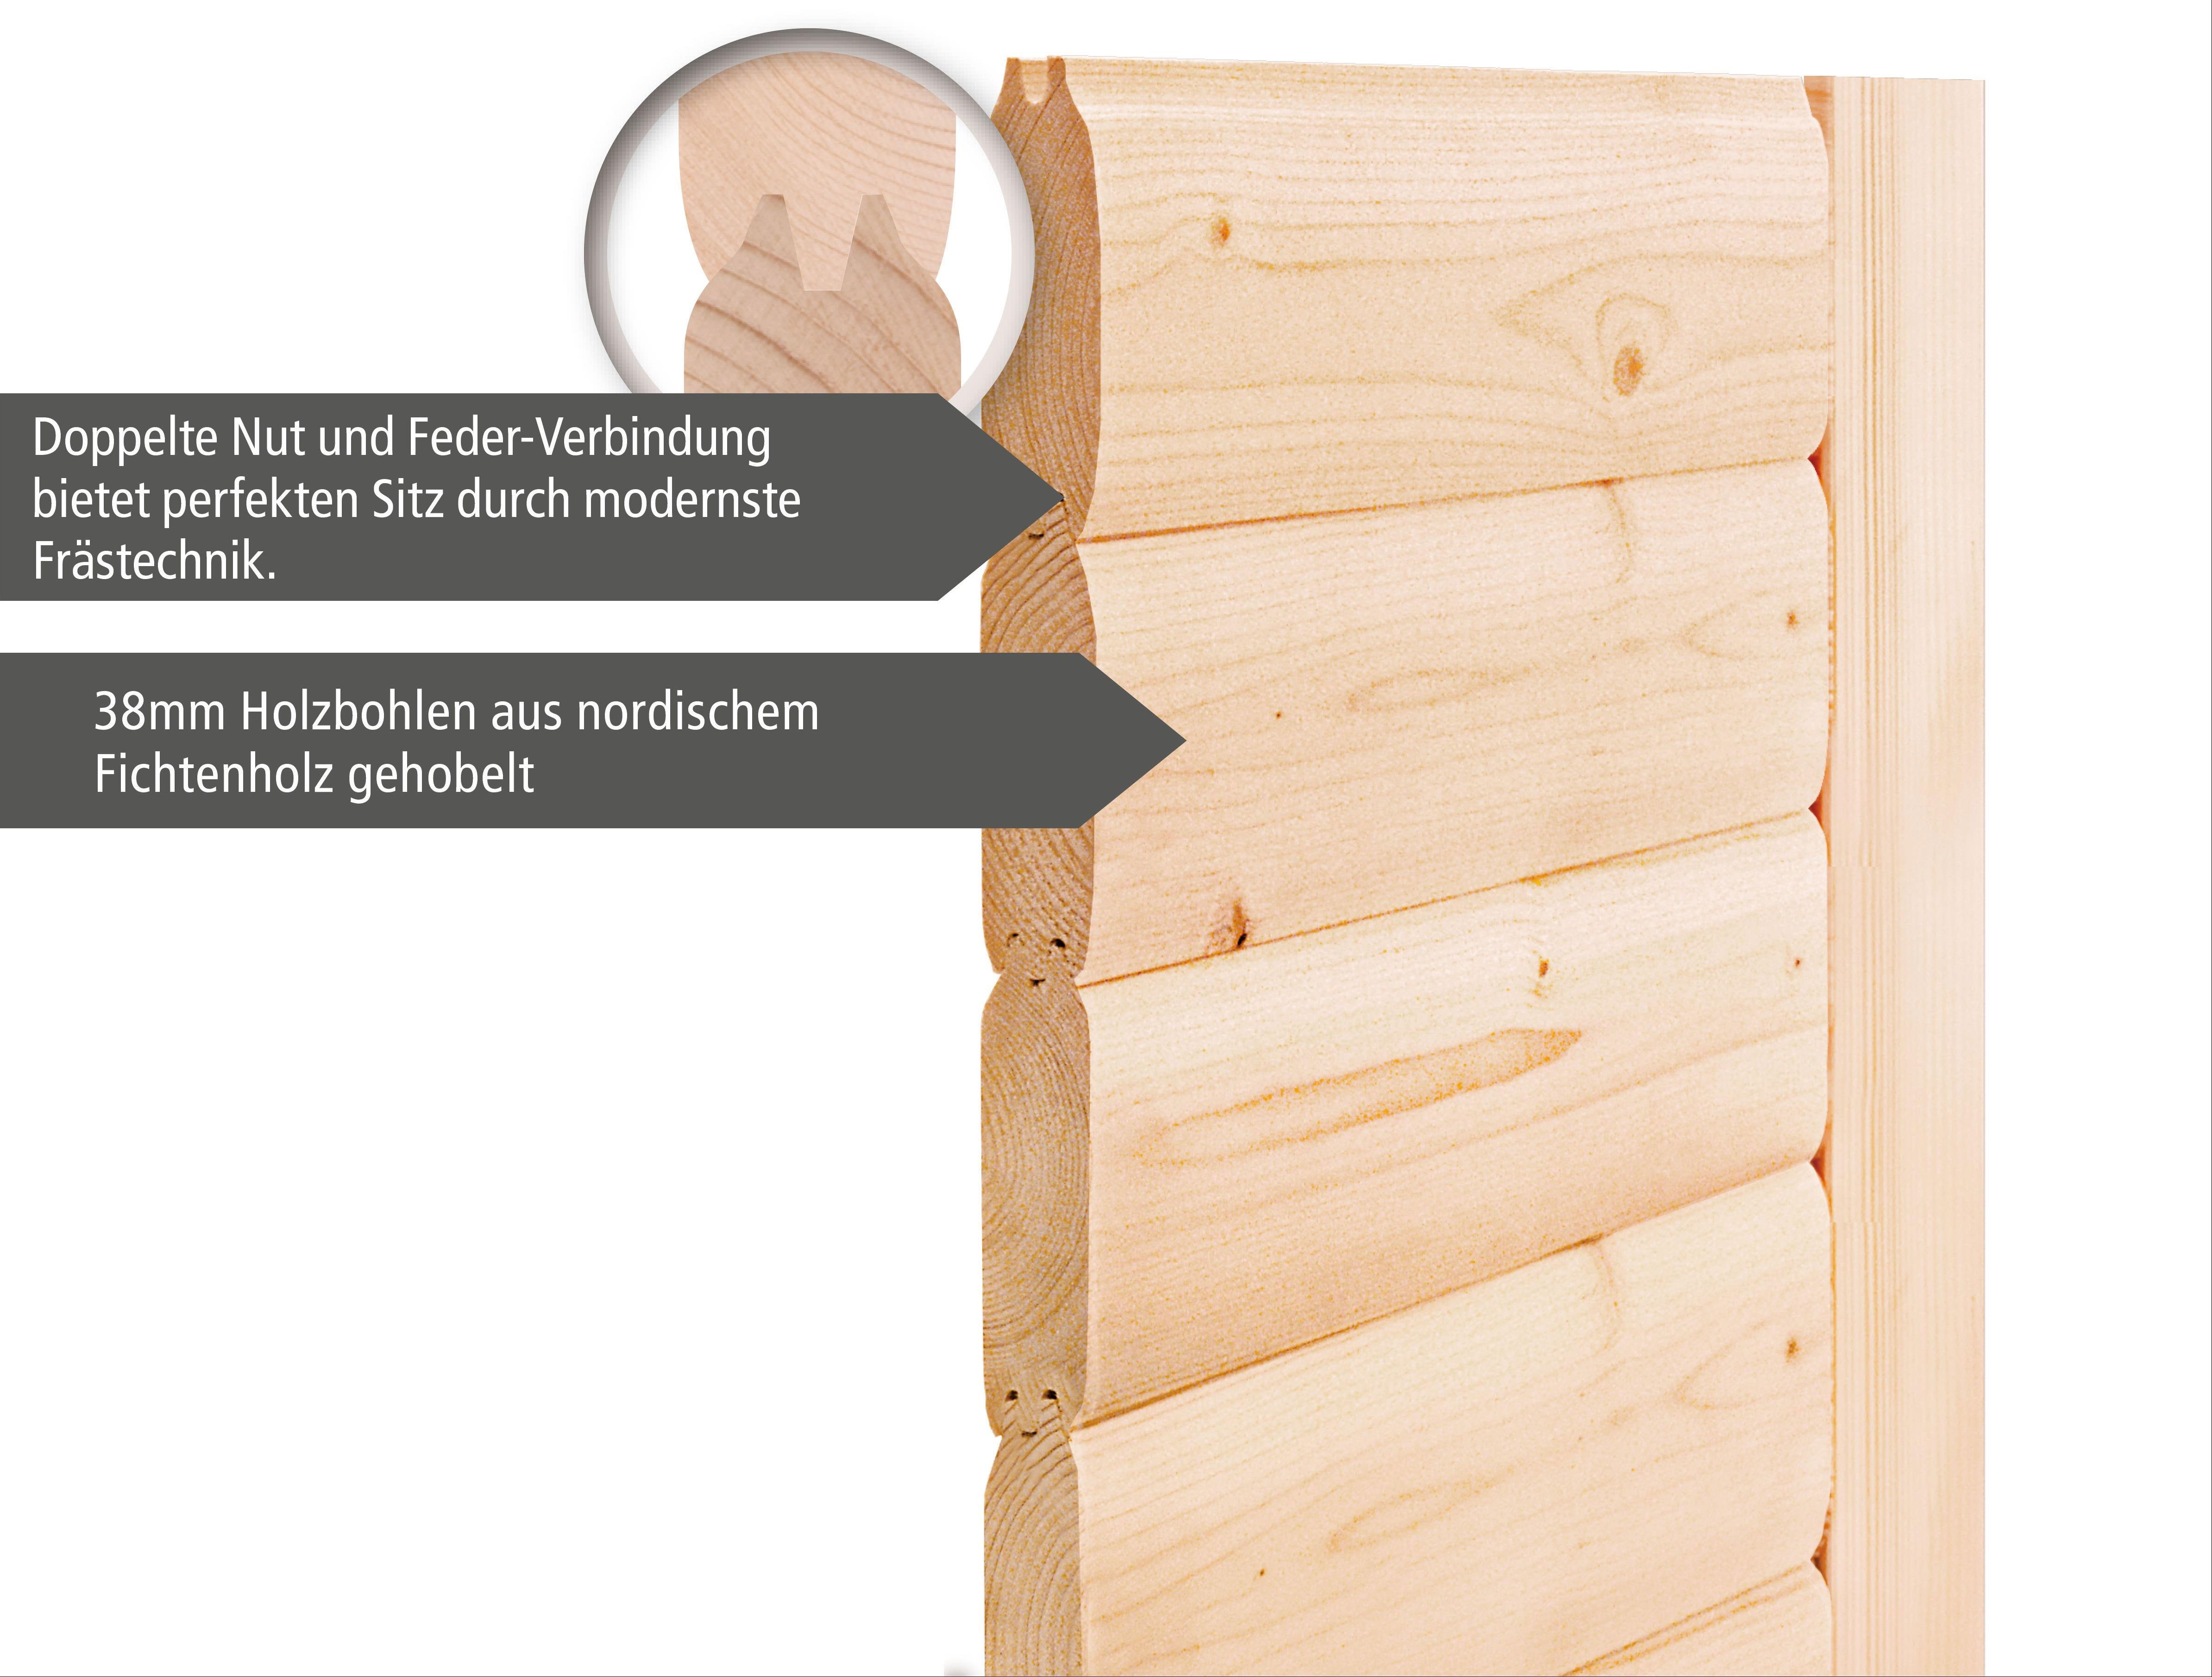 WoodFeeling Sauna Nina 38mm Bio Saunaofen 9kW extern Classic Tür Bild 5